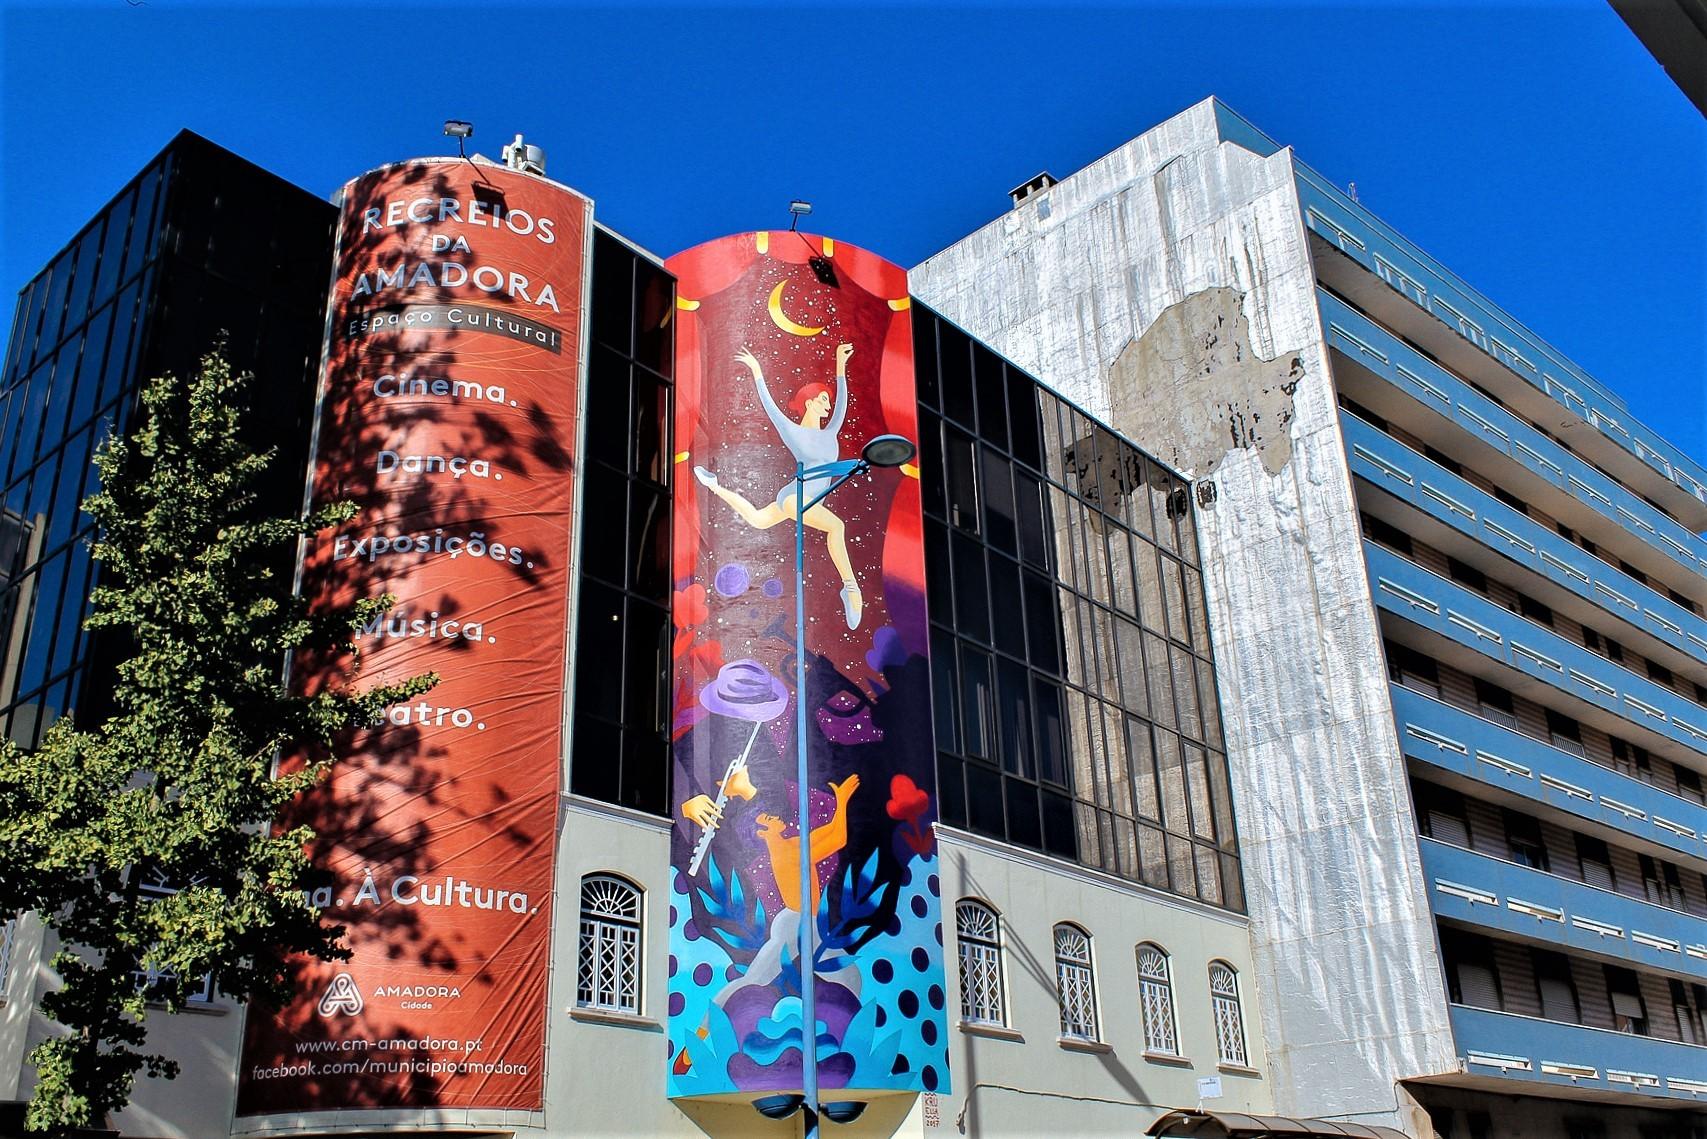 arte urbana na amadora